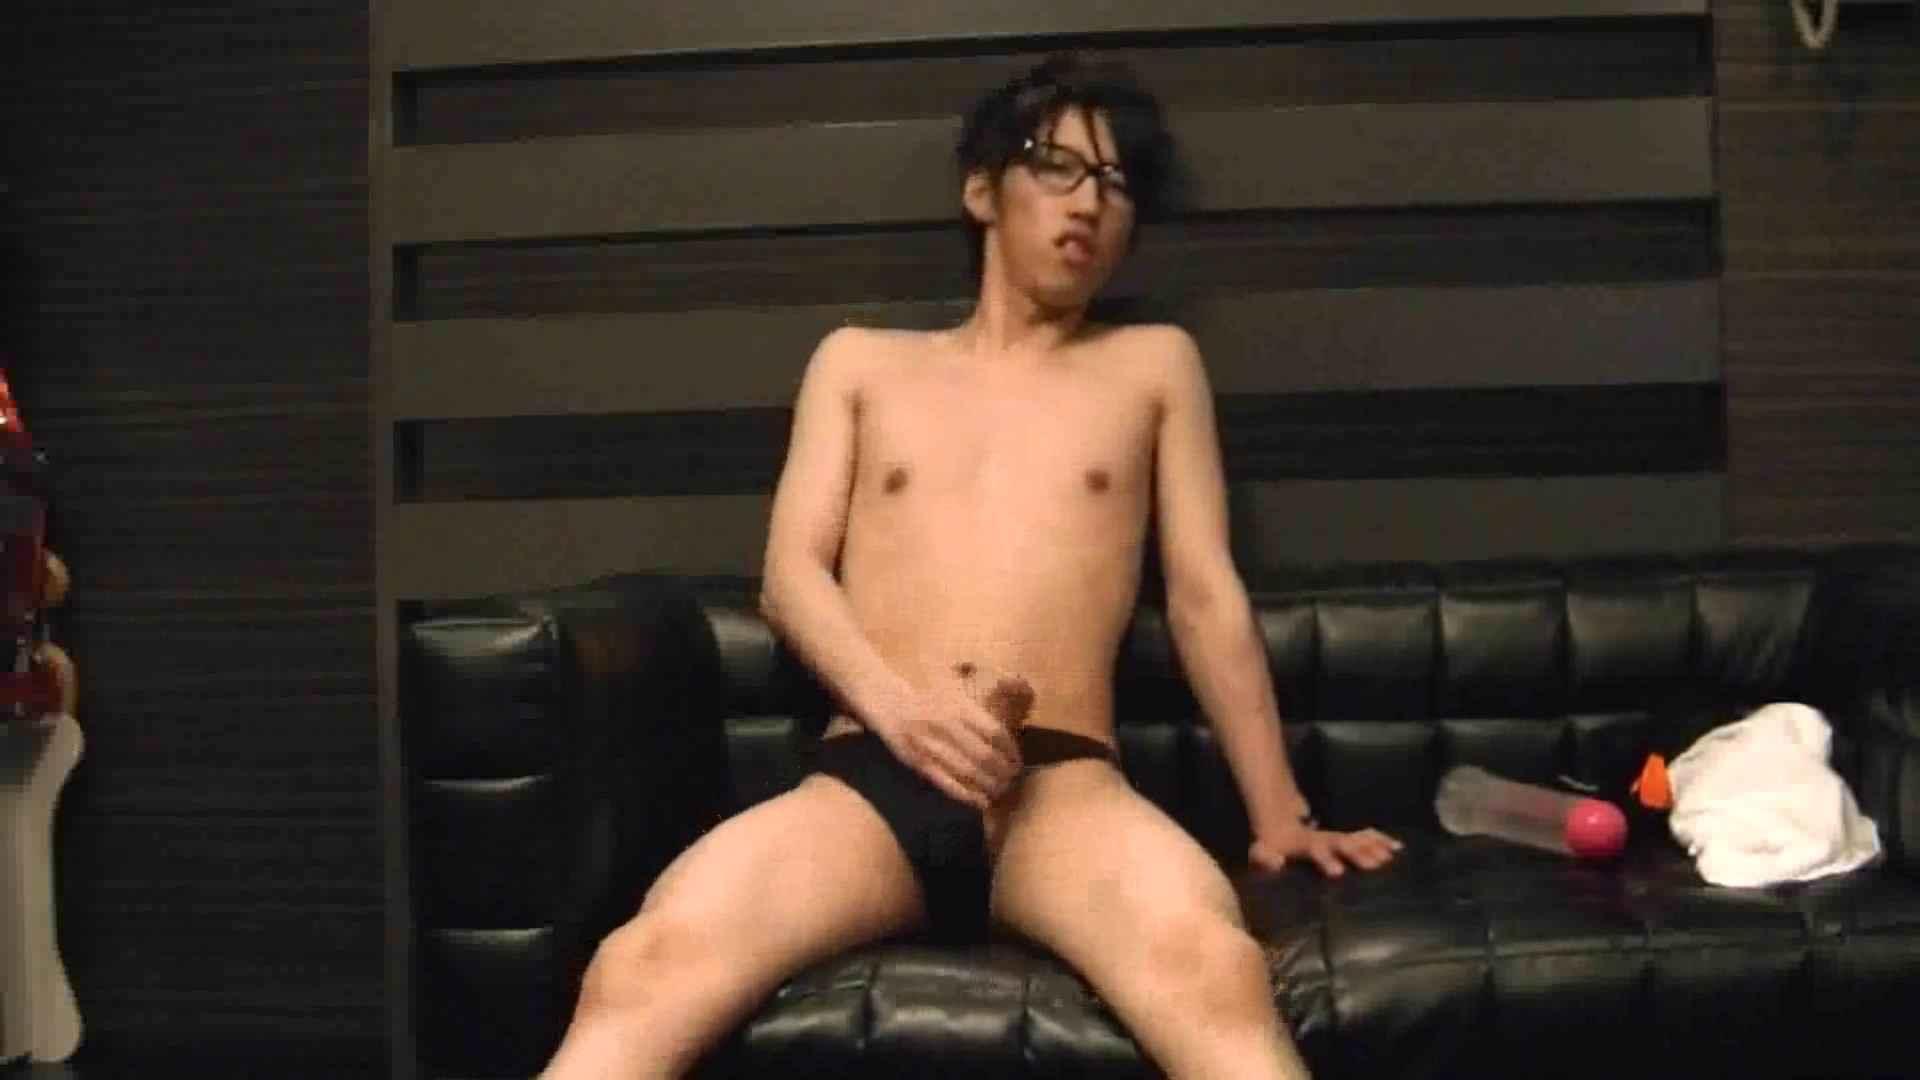 ONA見せカーニバル!! Vol3 男  93pic 68